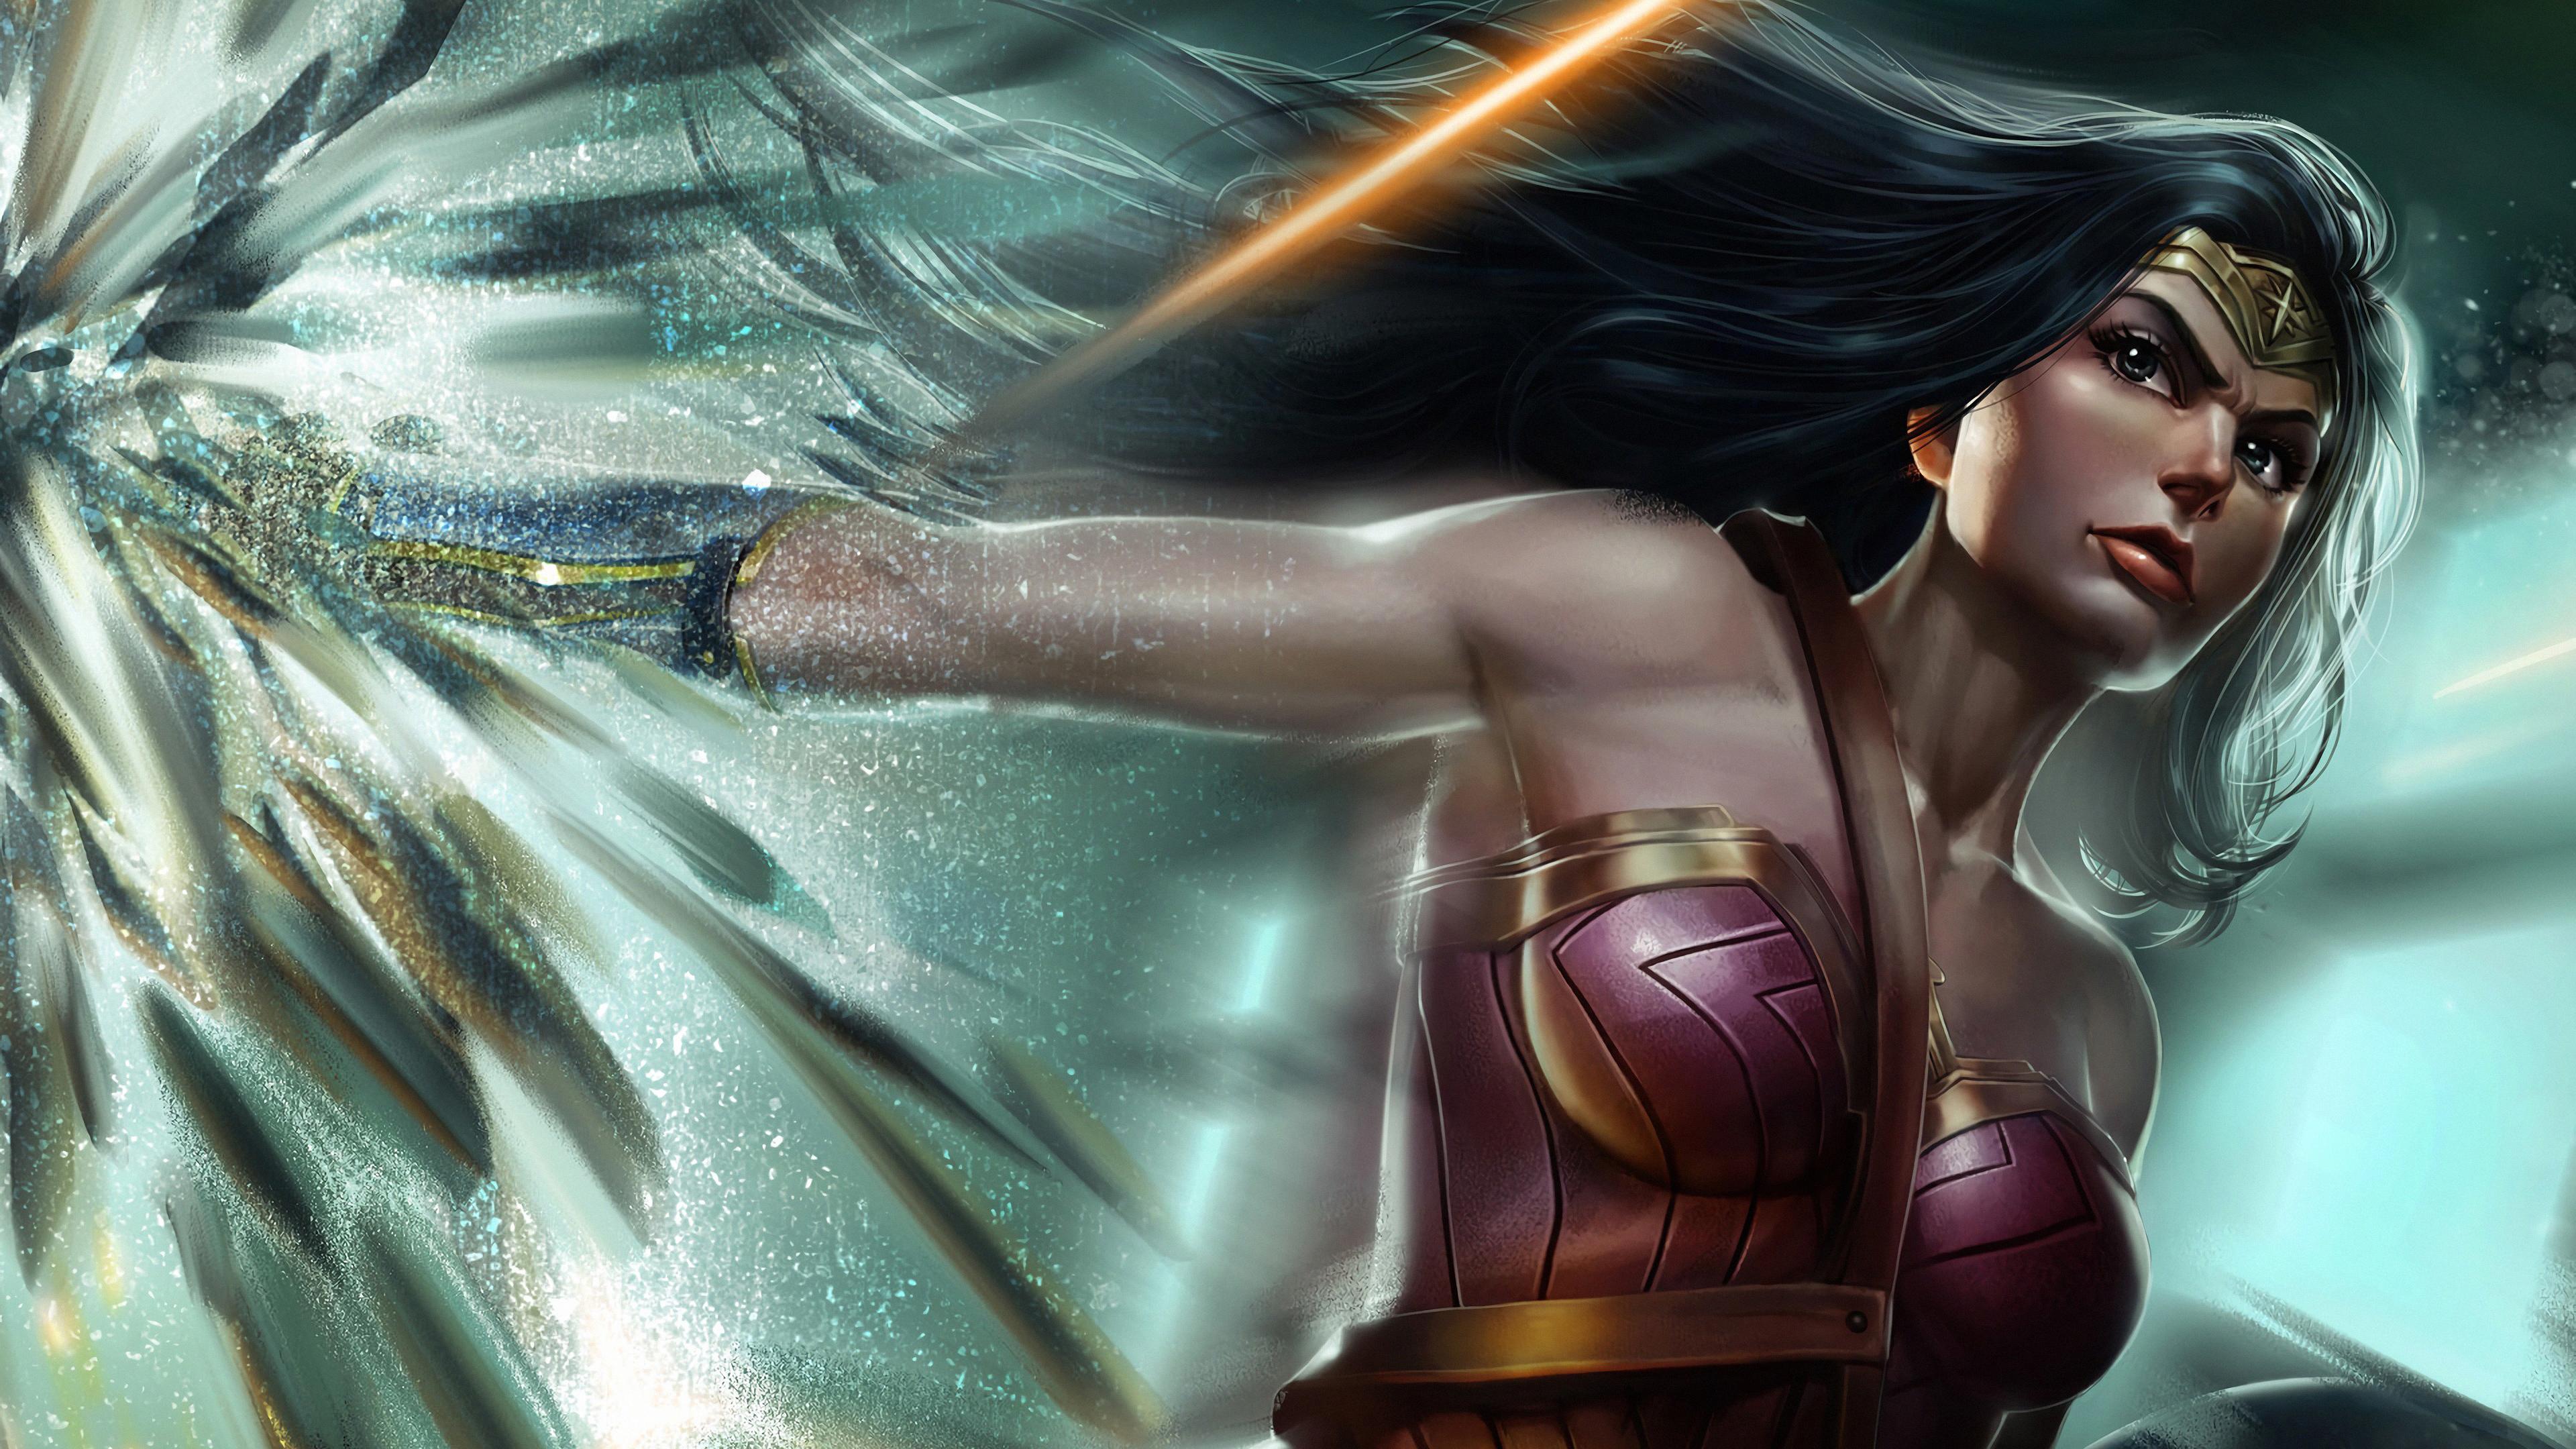 wonder woman digital arts 1568055208 - Wonder Woman Digital Arts - wonder woman wallpapers, superheroes wallpapers, hd-wallpapers, digital art wallpapers, artwork wallpapers, artstation wallpapers, 4k-wallpapers